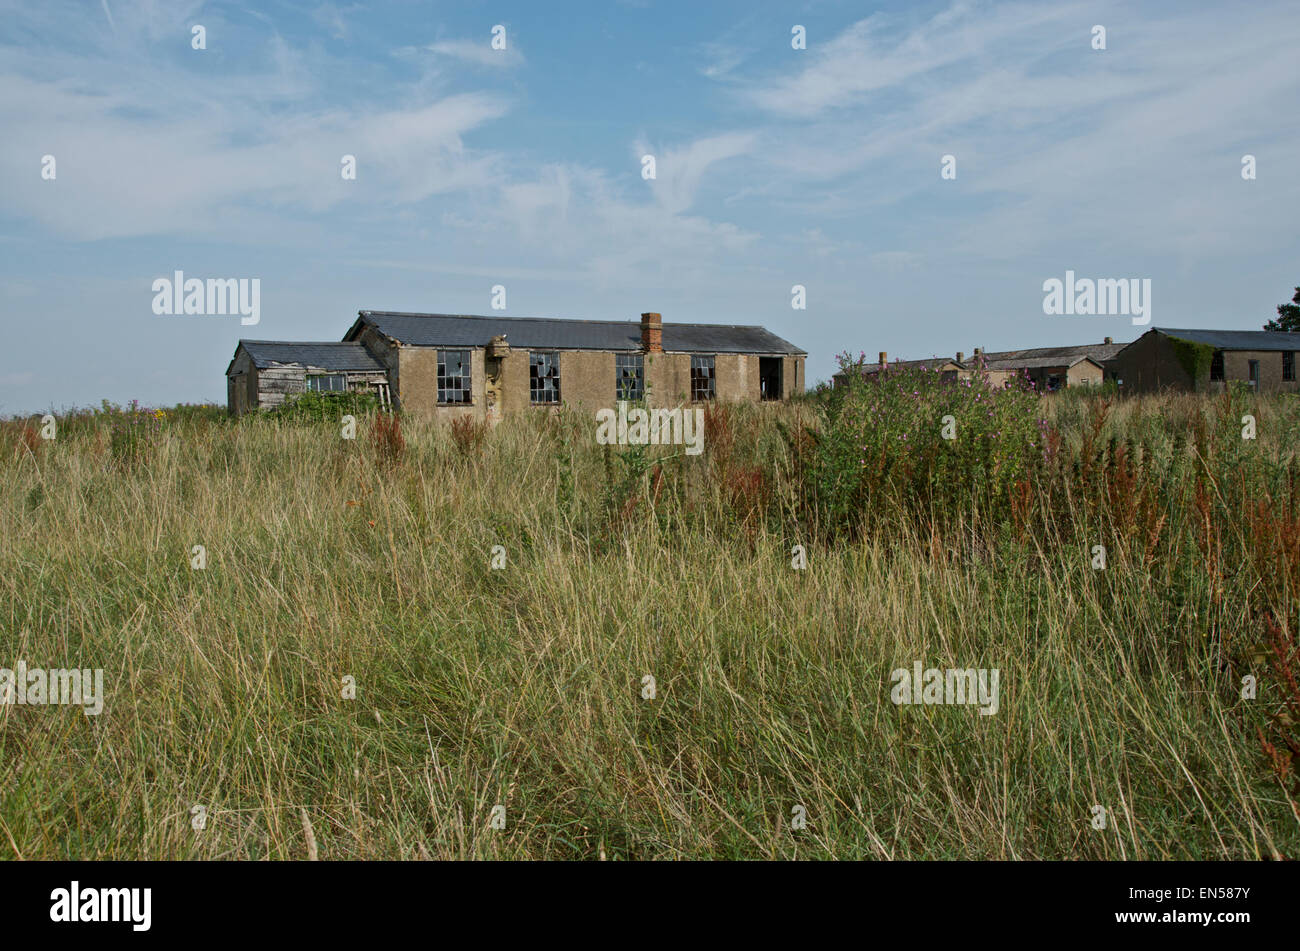 Dilapidated buildings at Stow Maries WWI Aerodrome - Stock Image